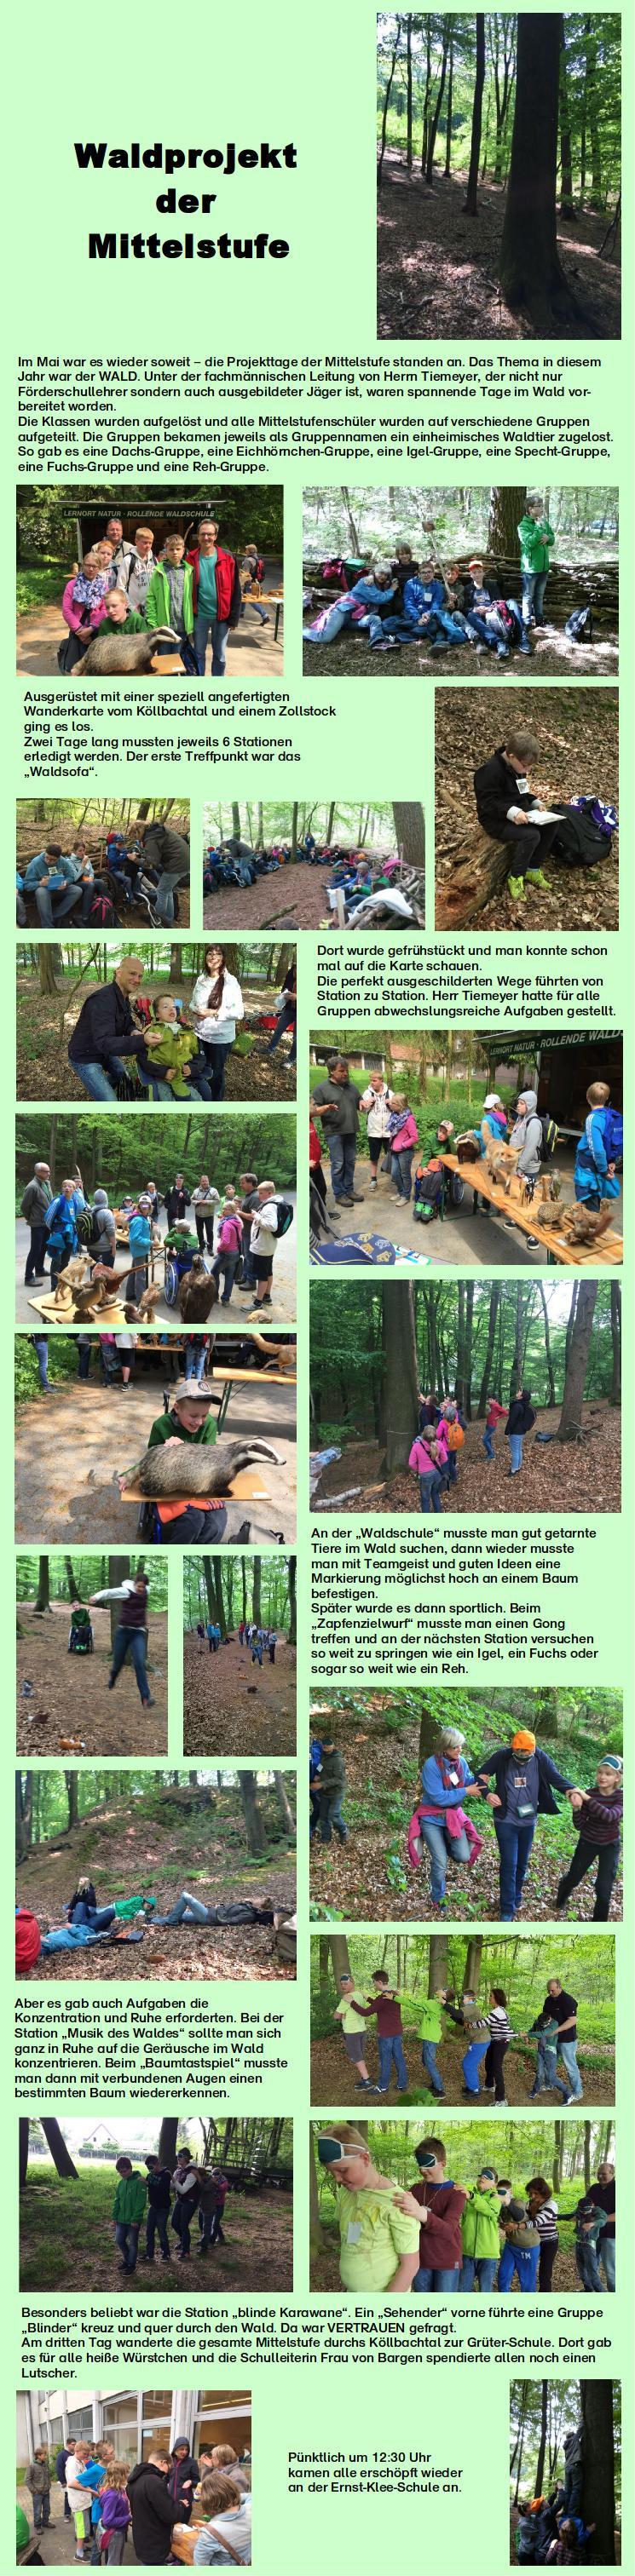 Waldprojekt